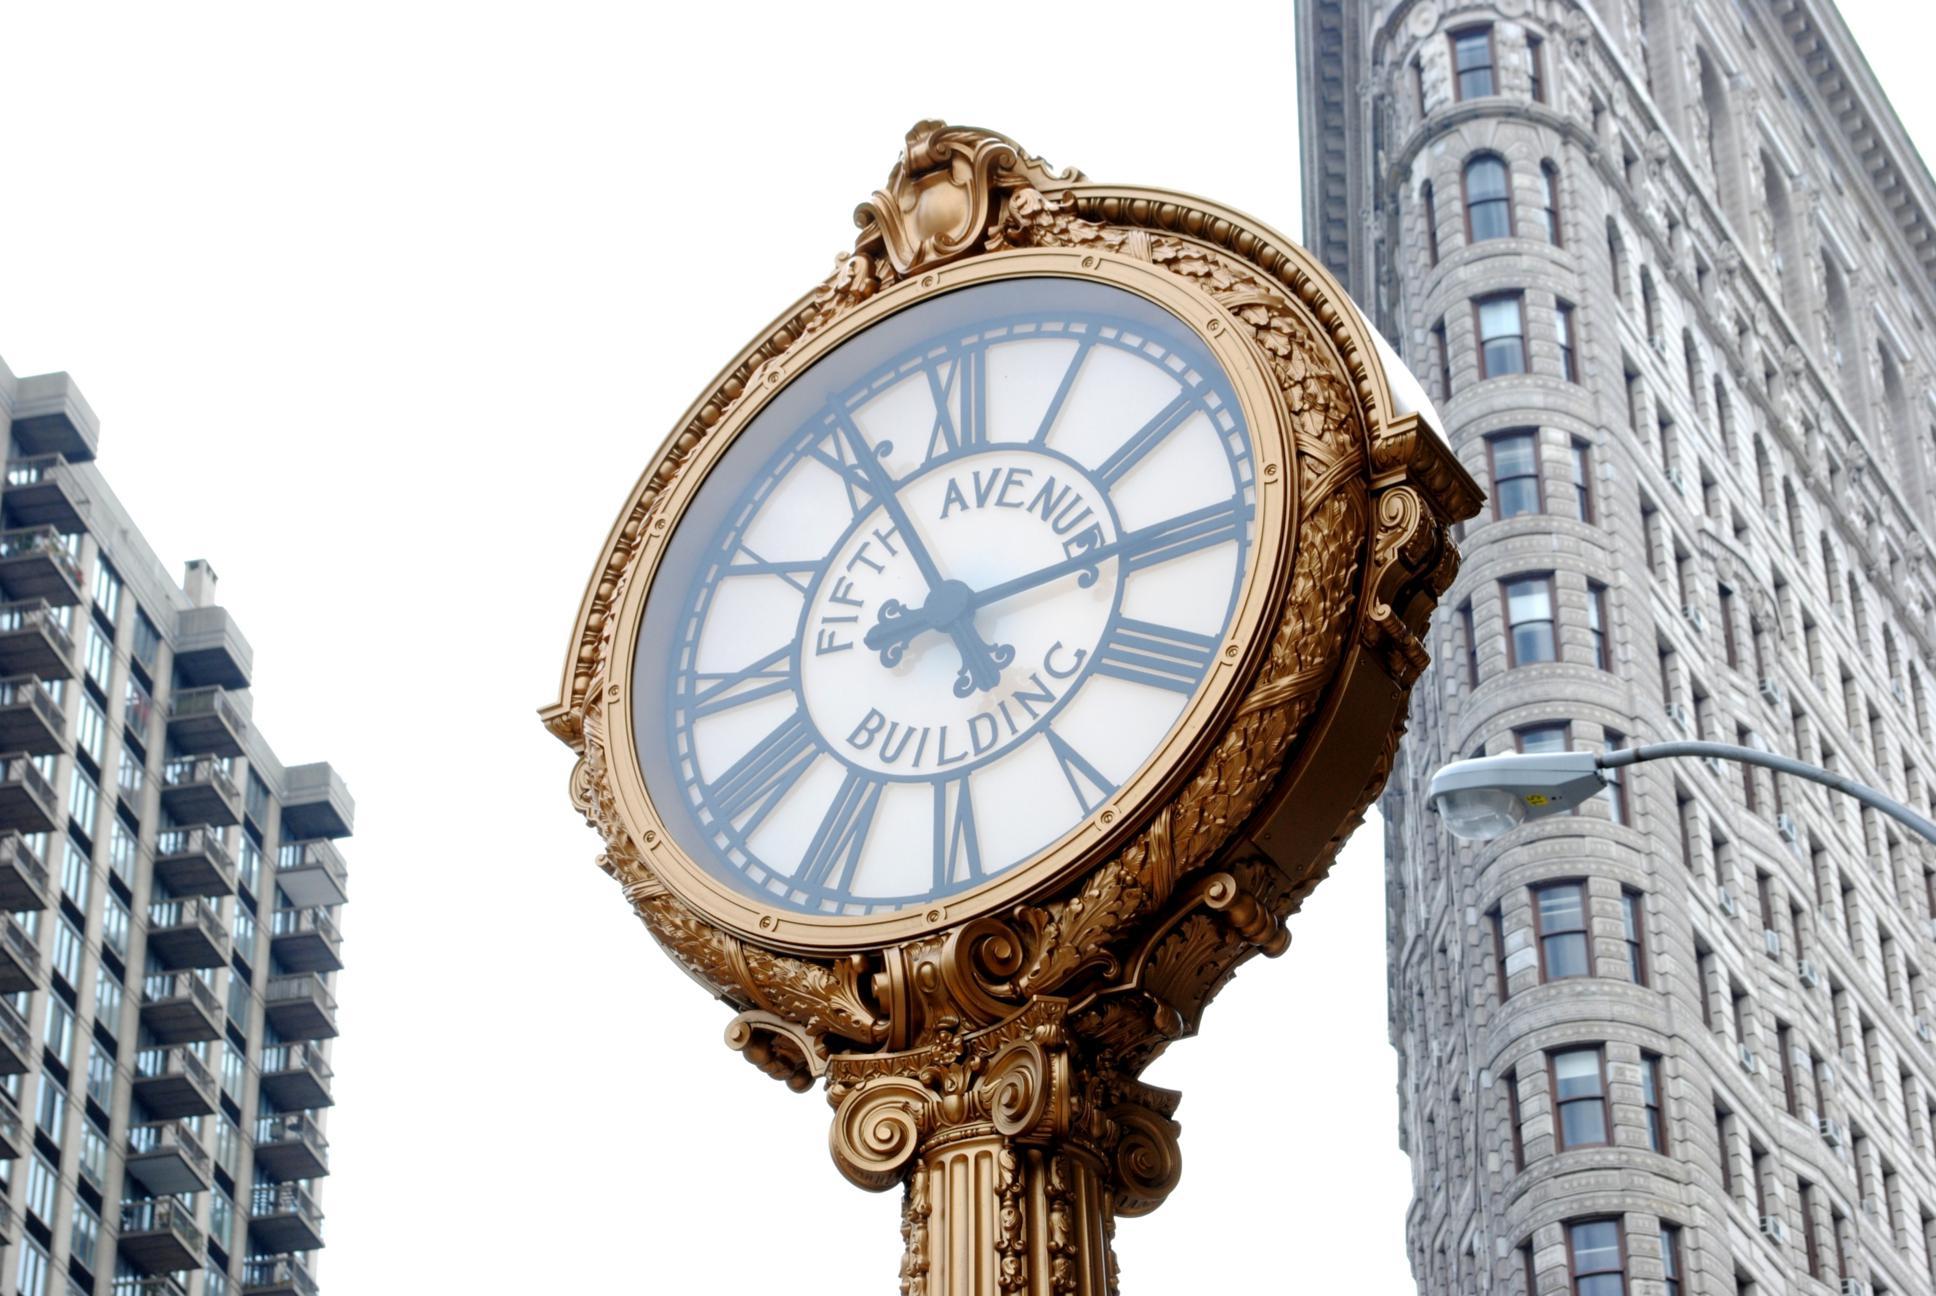 reloj-flatiron-2